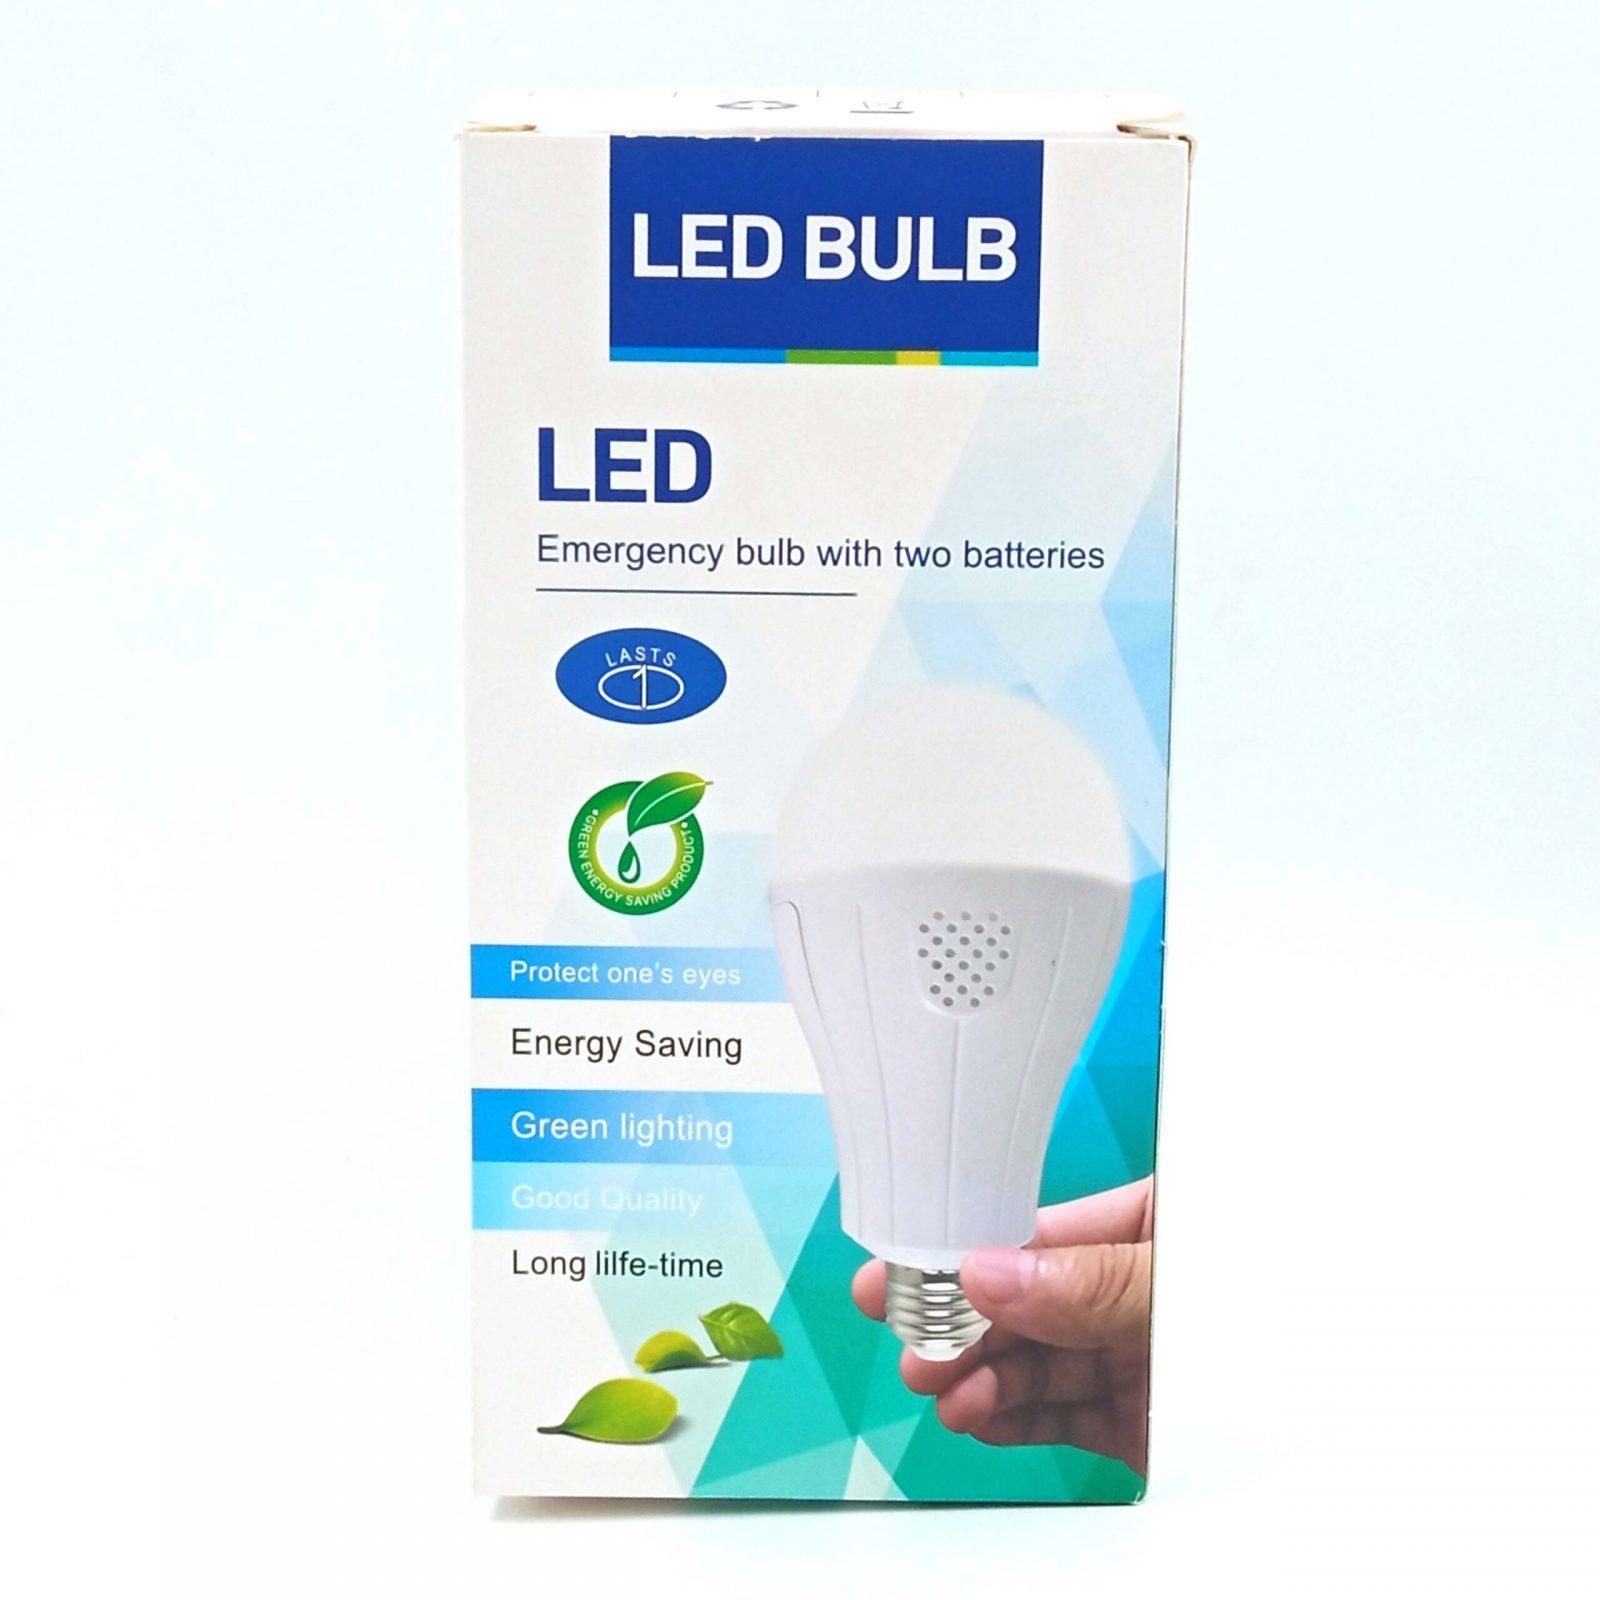 LED Bulb Emergency Light